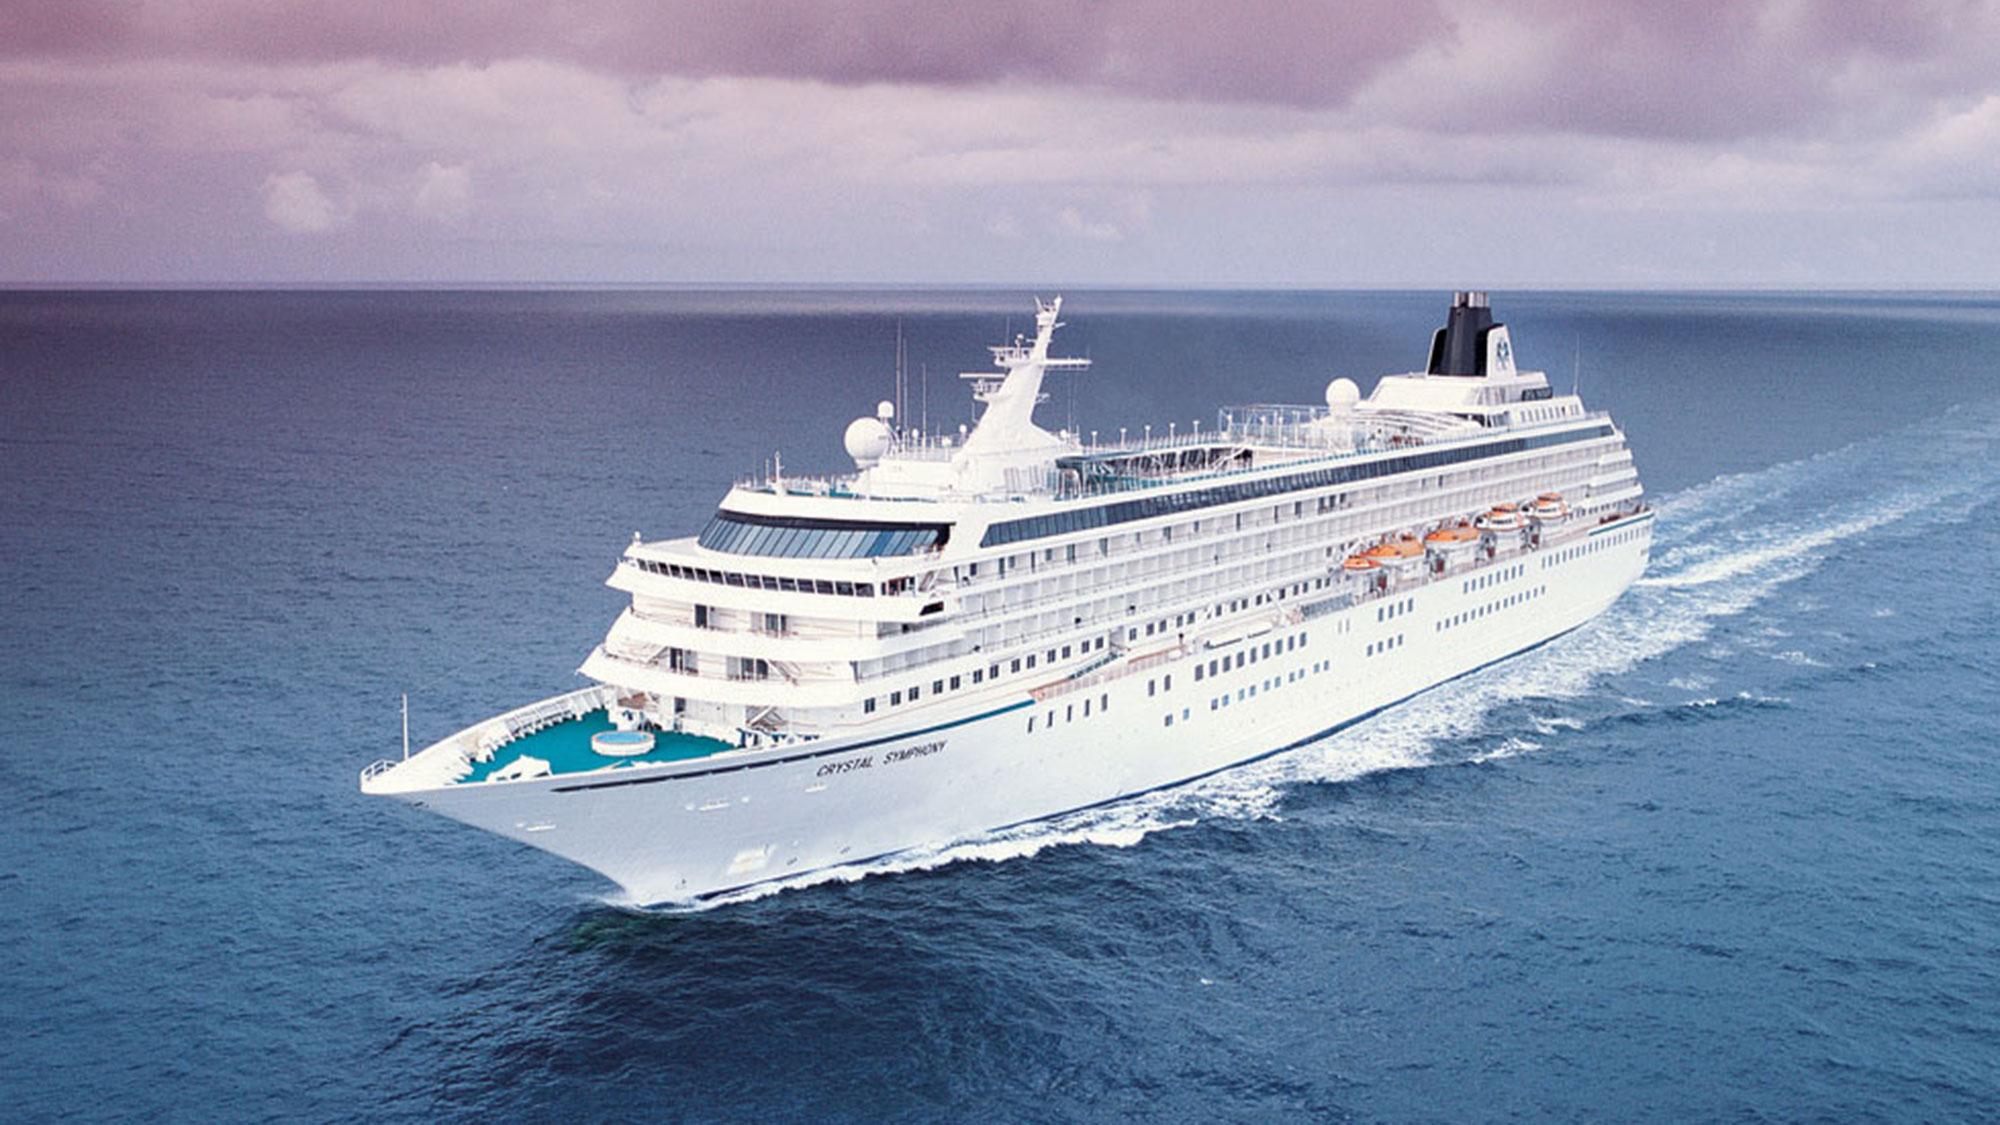 Crystal Cruises' Symphony kicks off Bermuda cruise series from Boston